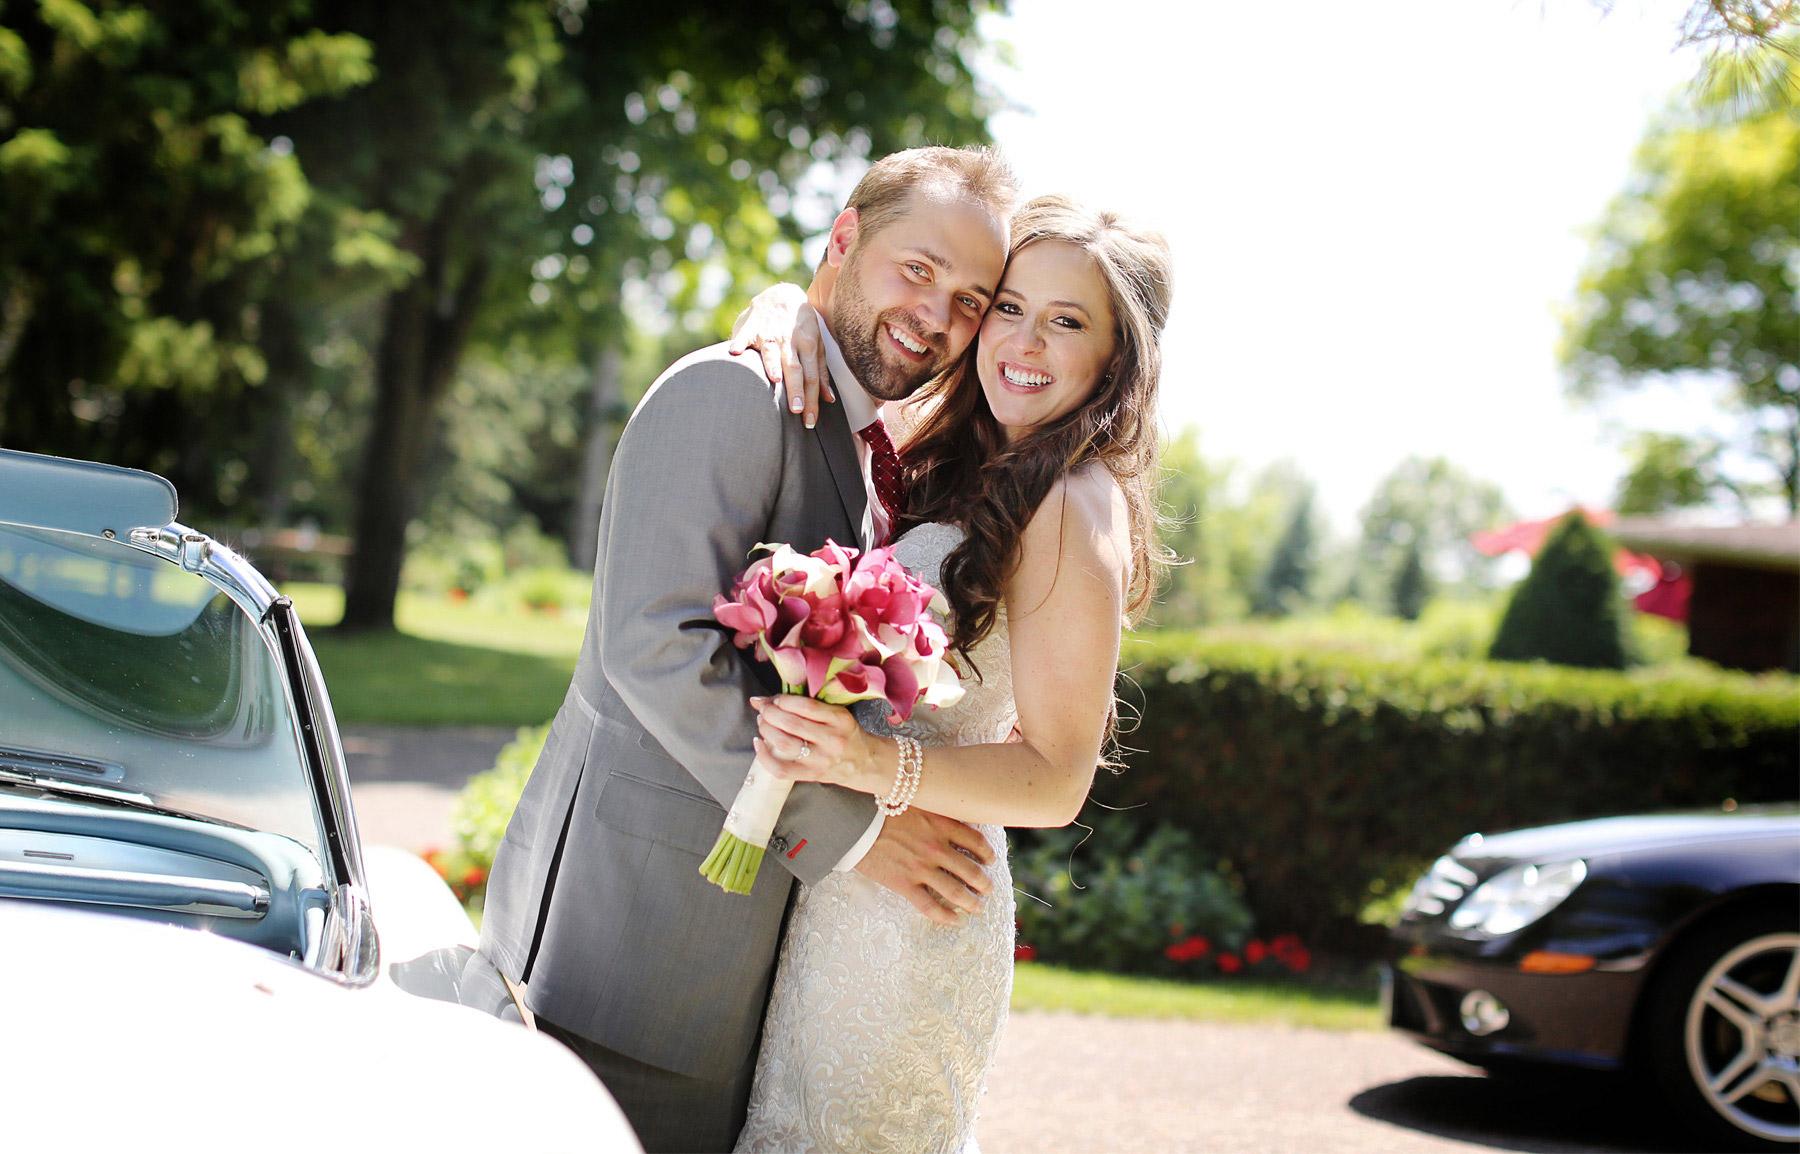 08-Minneapolis-Minnesota-Wedding-Photographer-by-Andrew-Vick-Photography-Summer-Edina-Classic-Car-Dress-Flowers-Bride-Groom-Natalie-and-Andrew.jpg